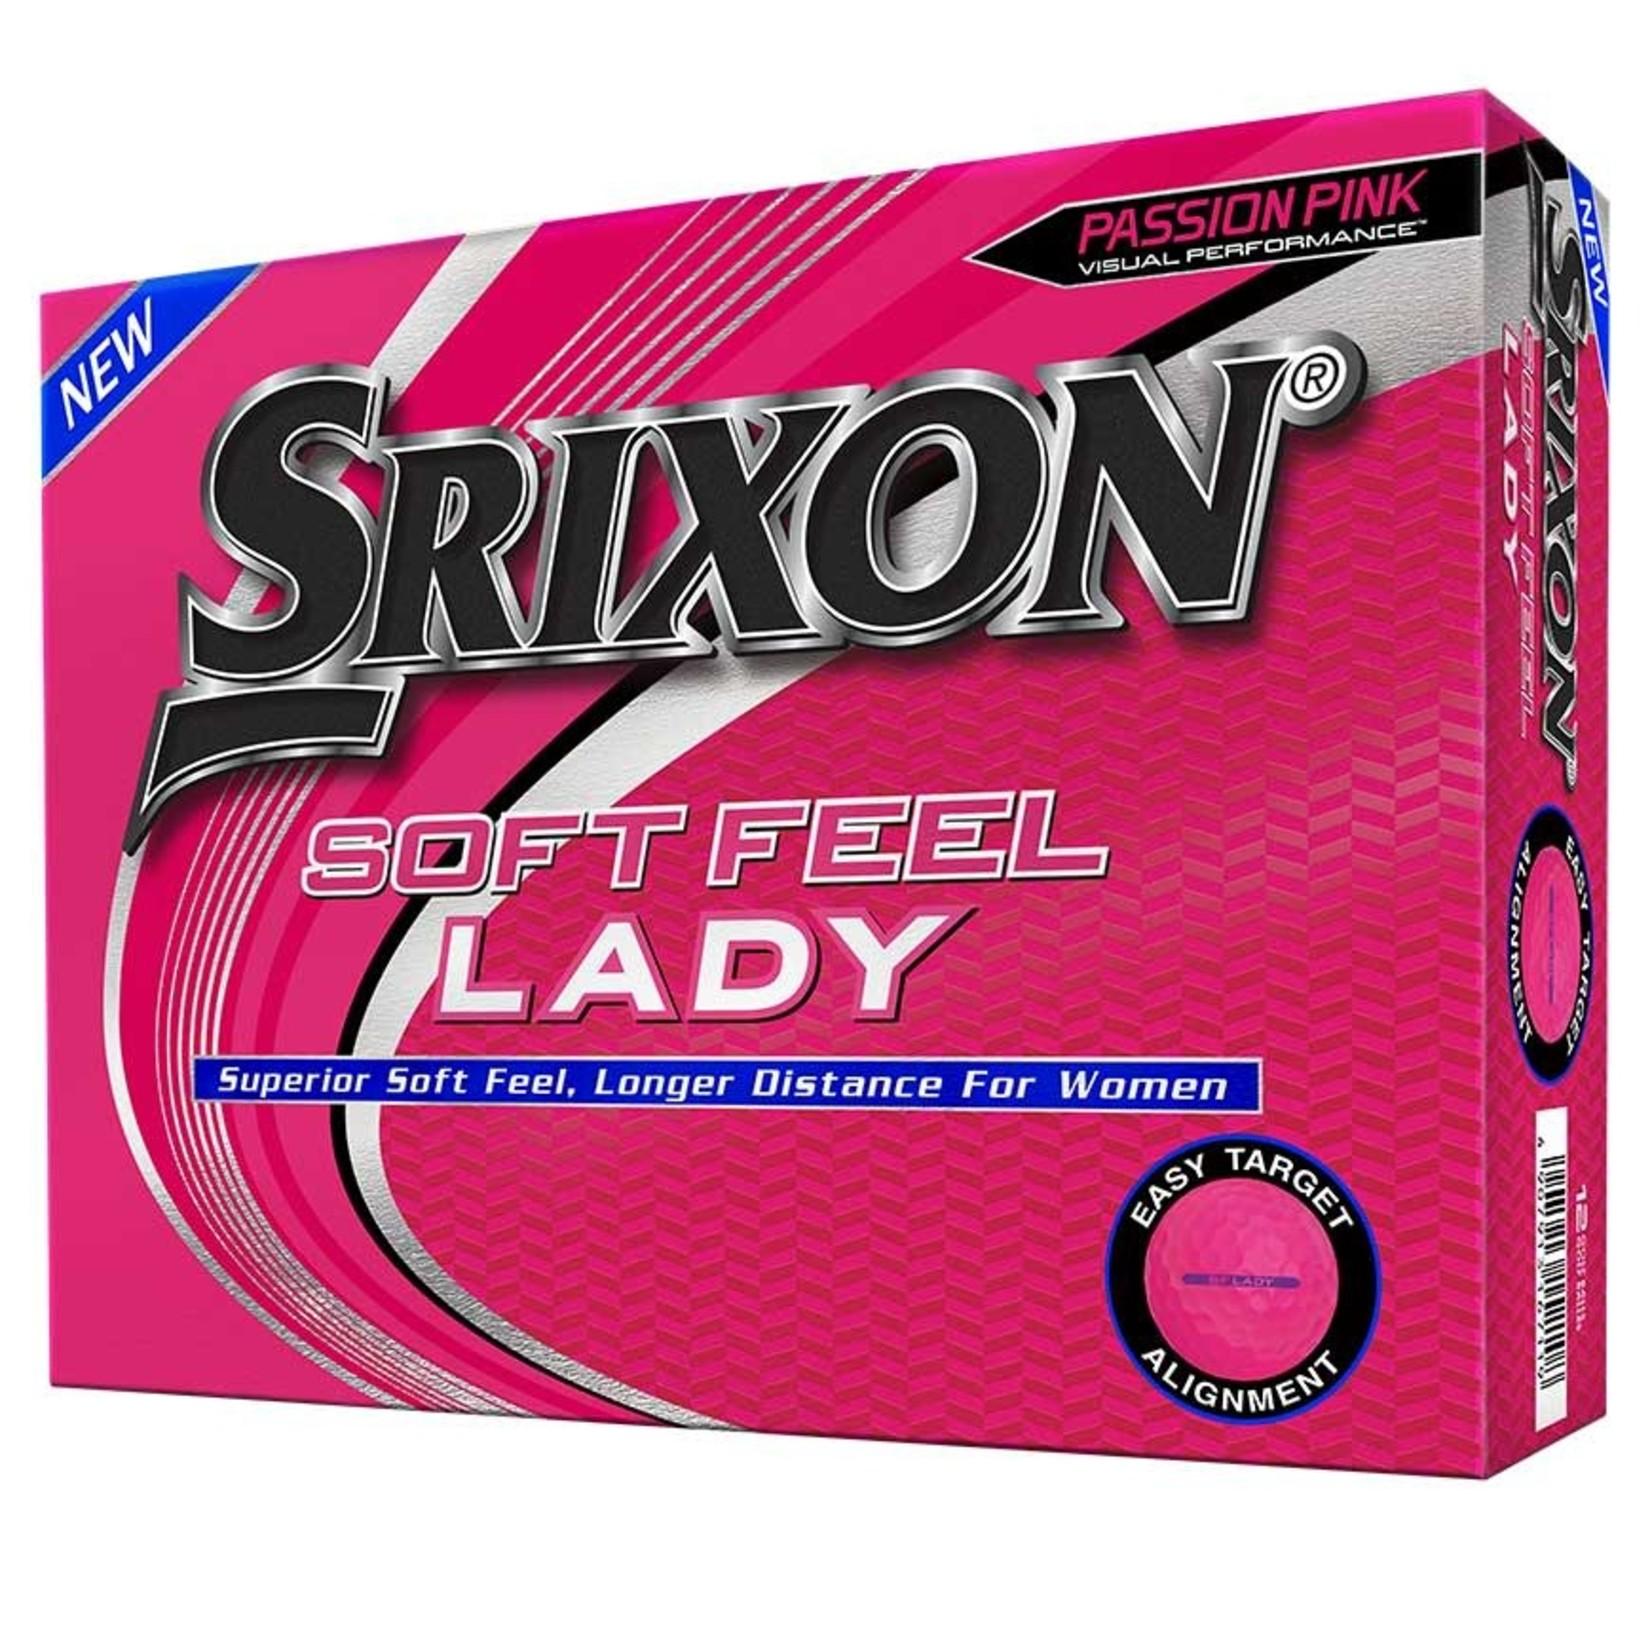 Srixon Srixon SoftFeel Lady Pink